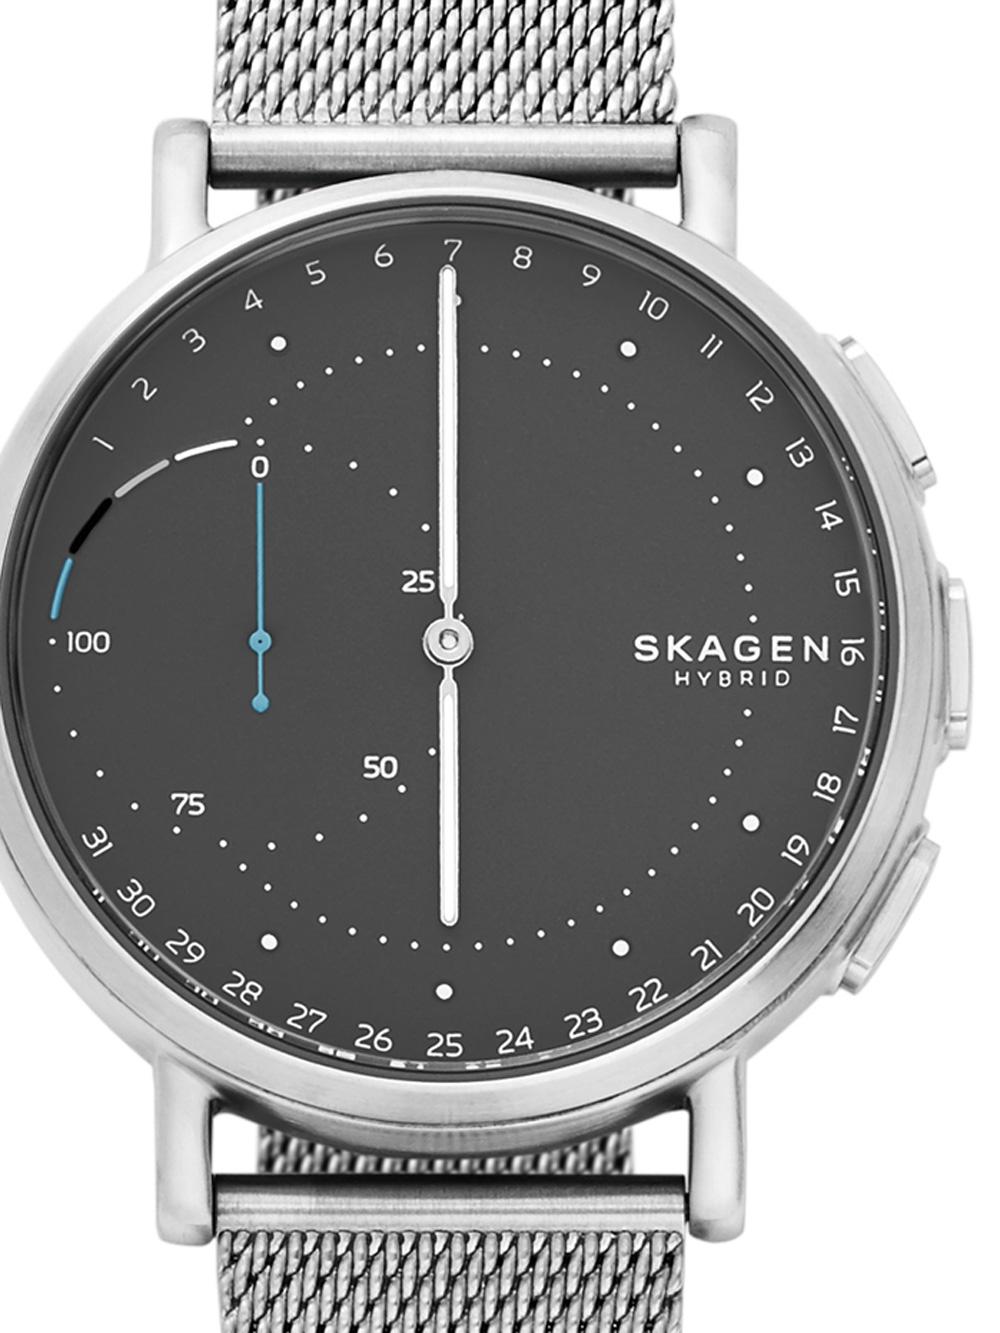 Skagen SKT1113 Signatur Hybrid Smartwatch 42mm 3ATM